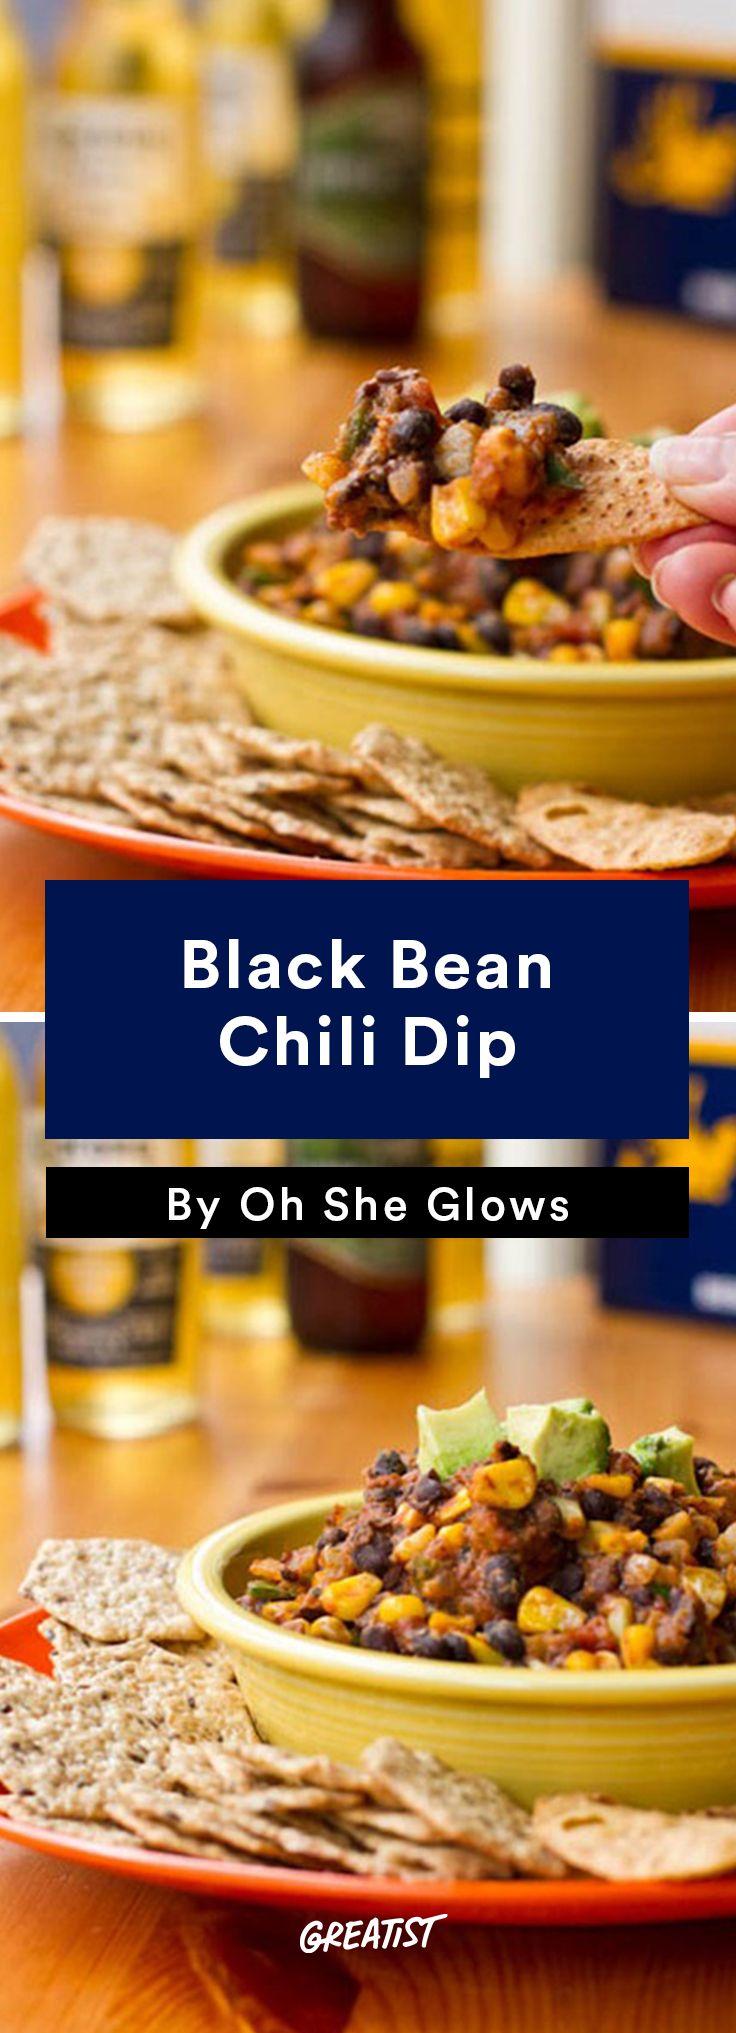 Oh She Glows bowl: Chili Dip